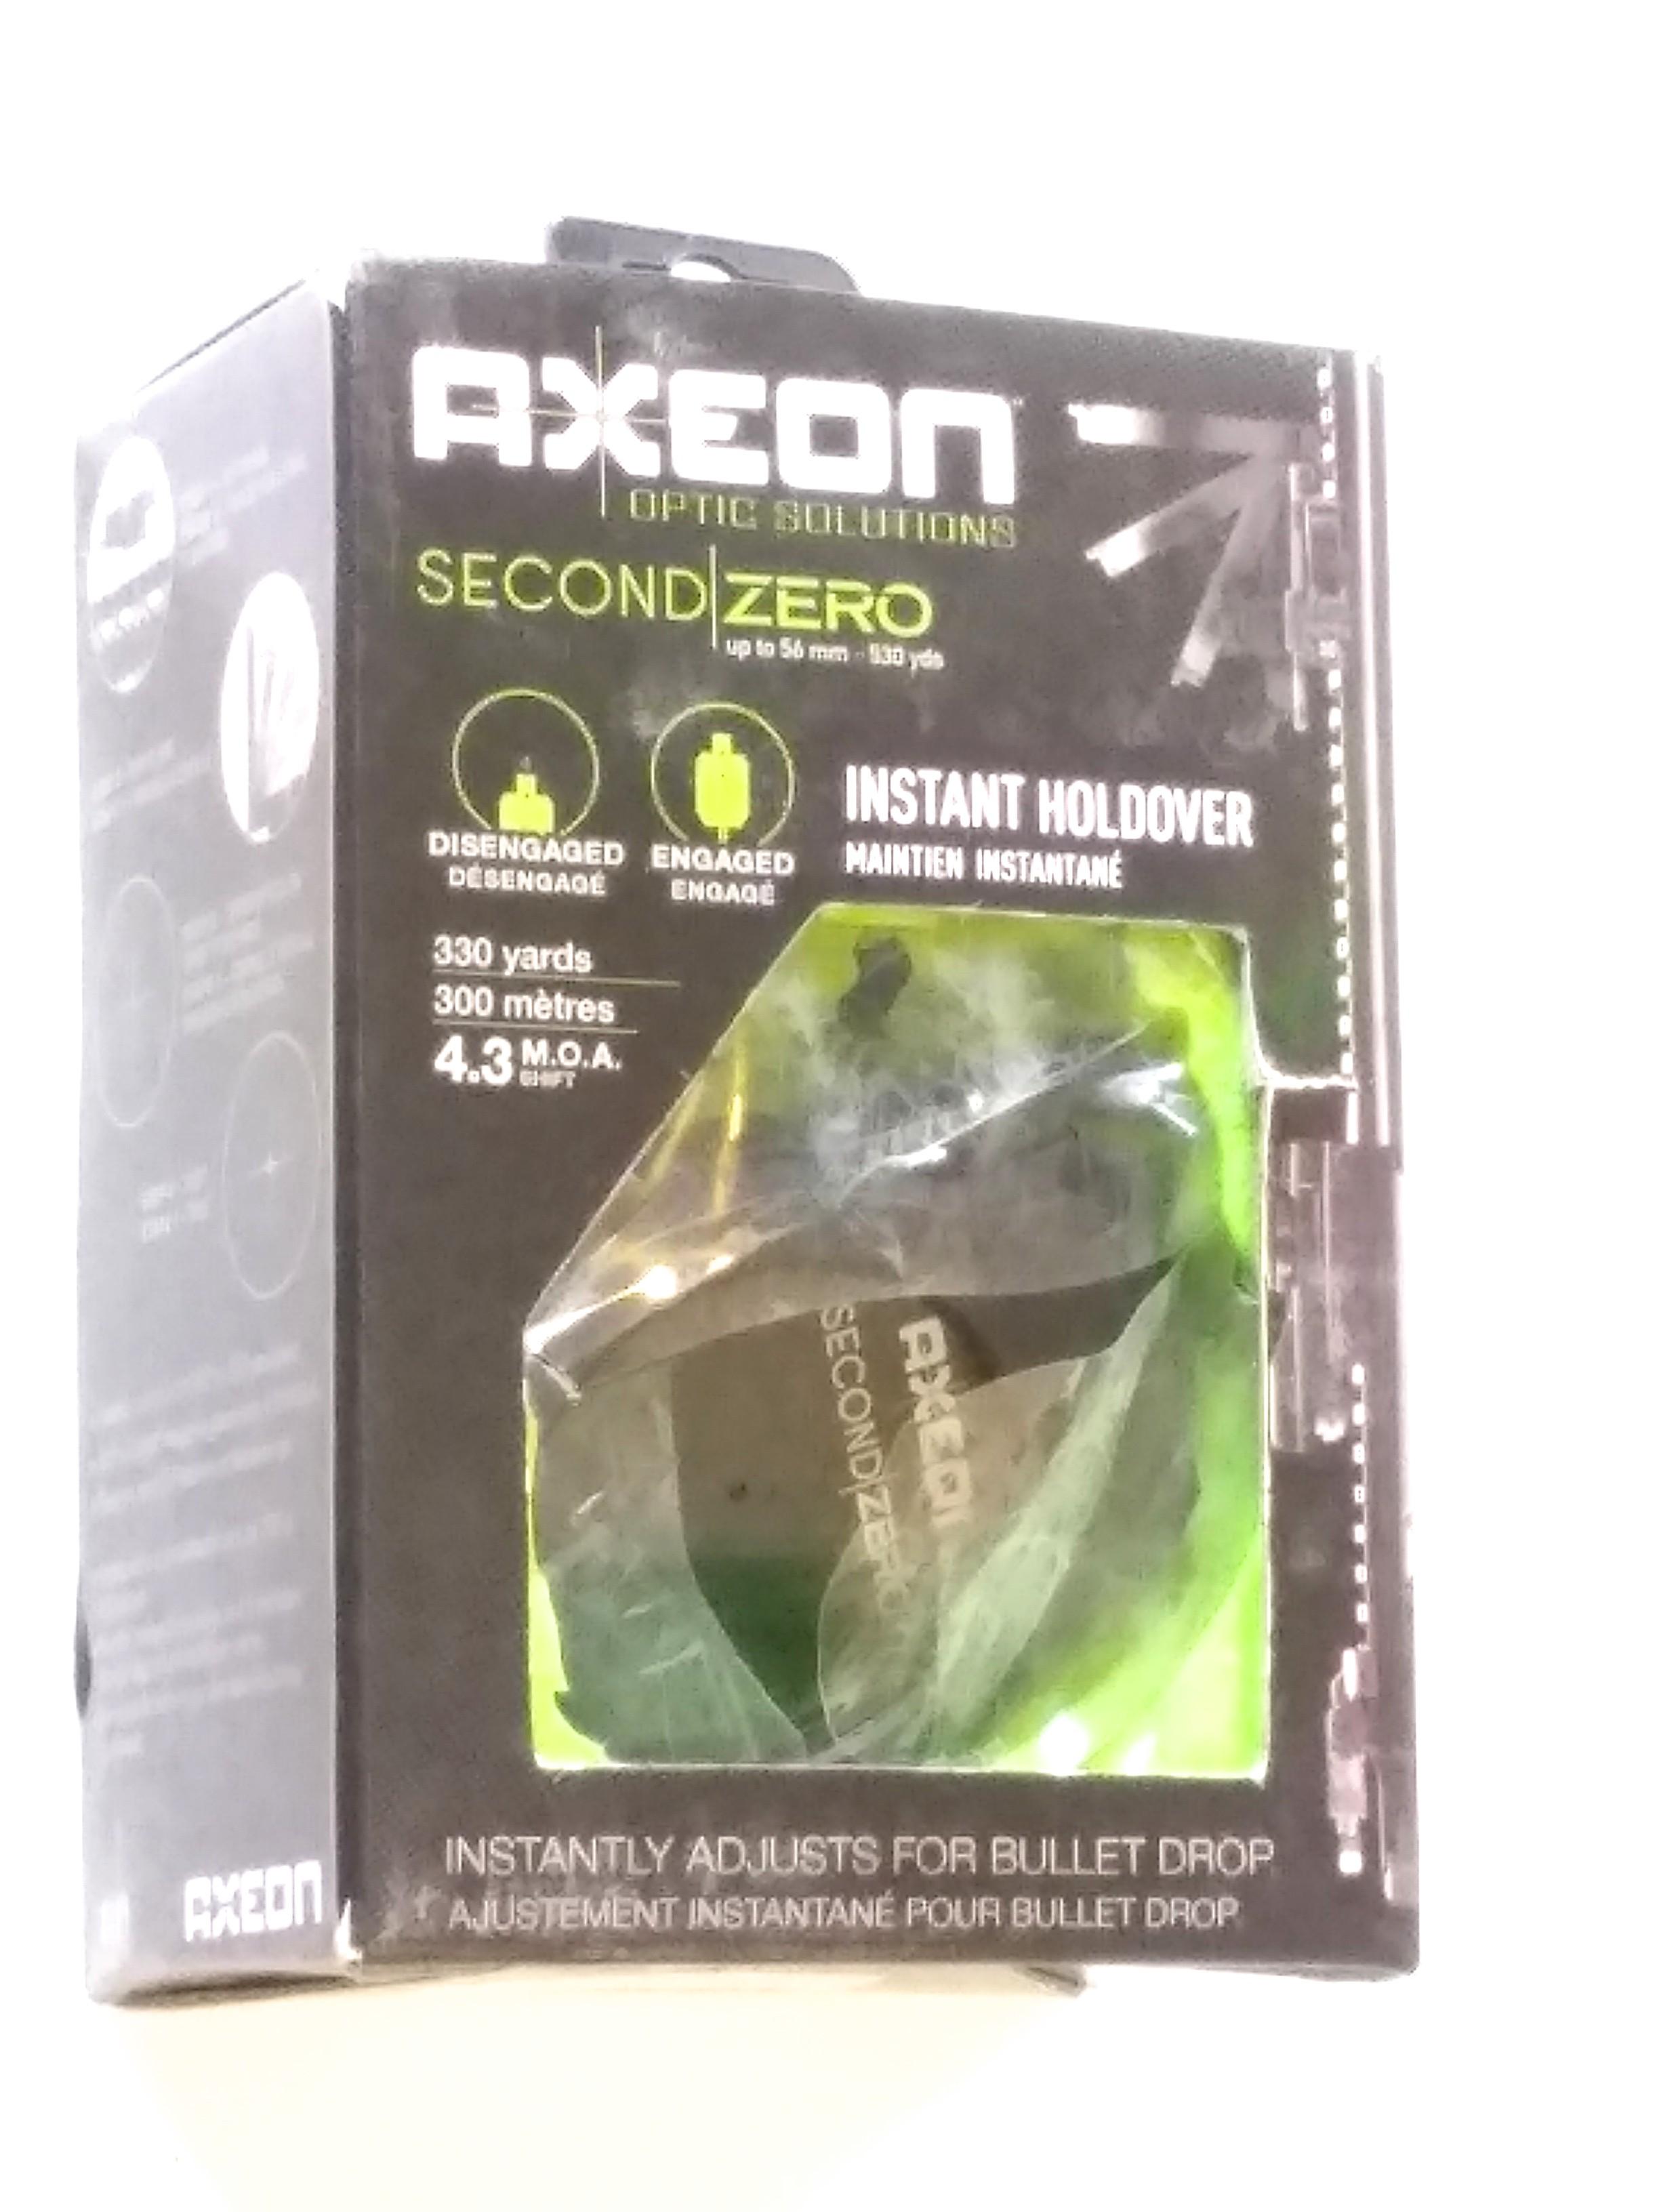 Axeon Optics Second Zero 4.3 MOA - Bell Mount 50mm